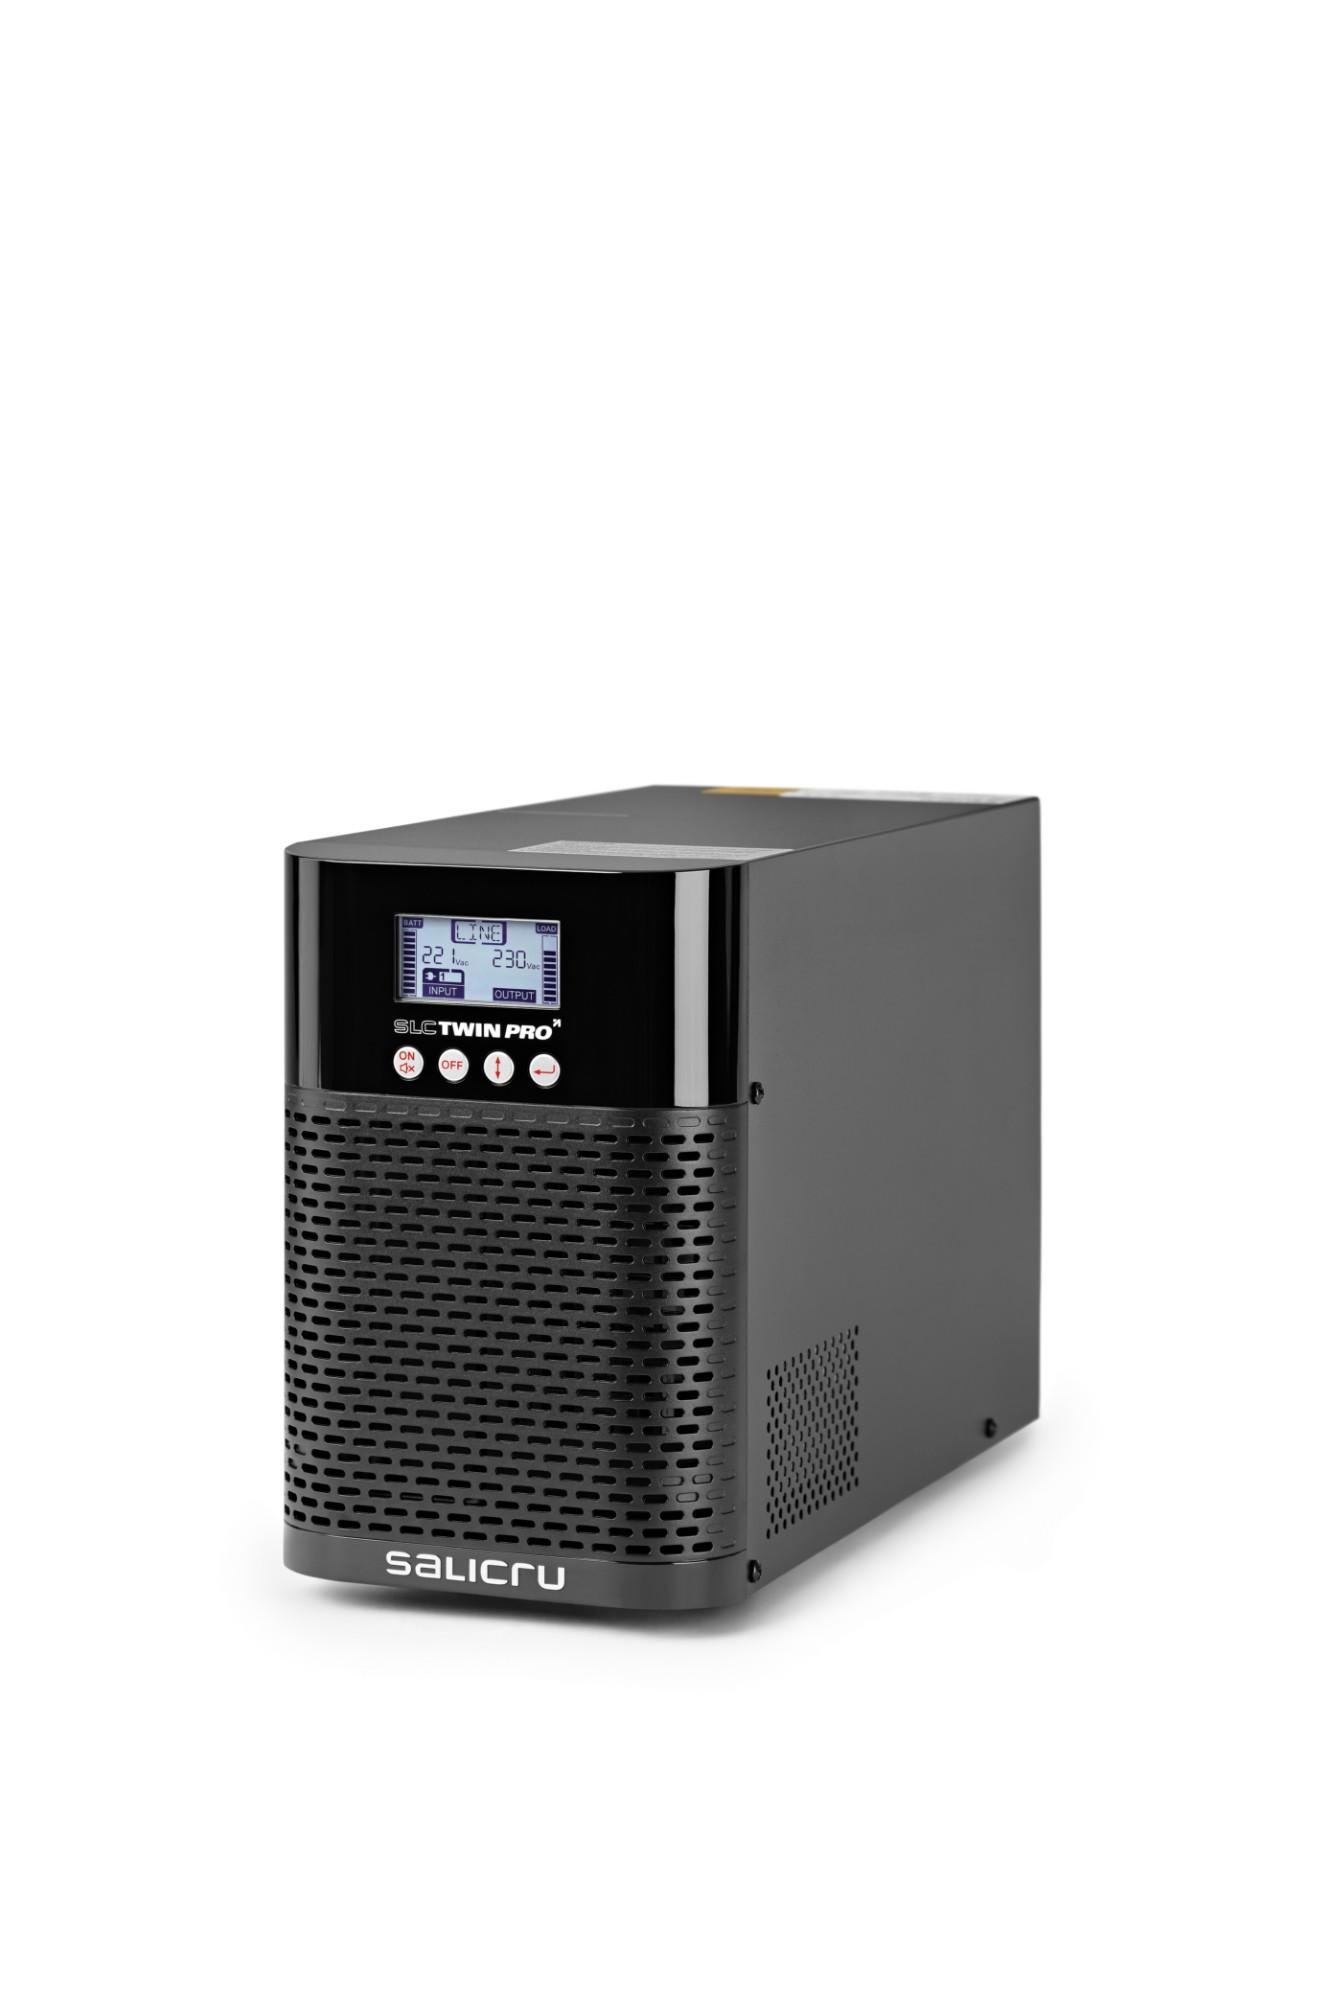 Salicru SLC 700 TWIN PRO2 IEC SAI On-line doble conversión de 700 VA a 3000 VA